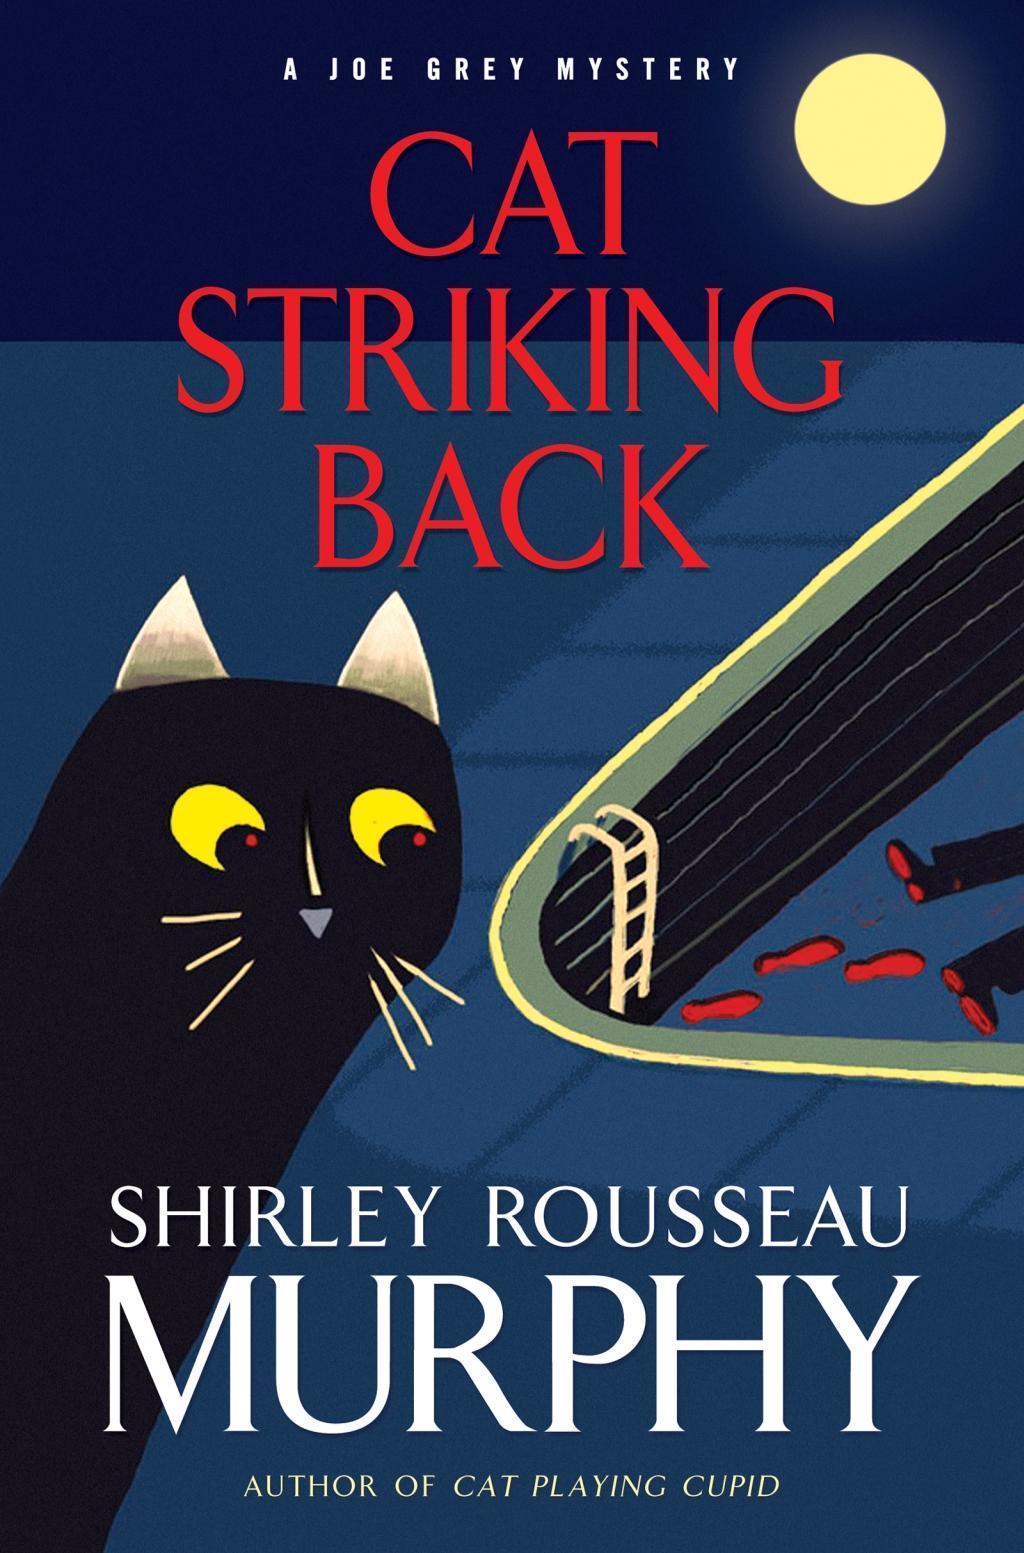 Cat Striking Back